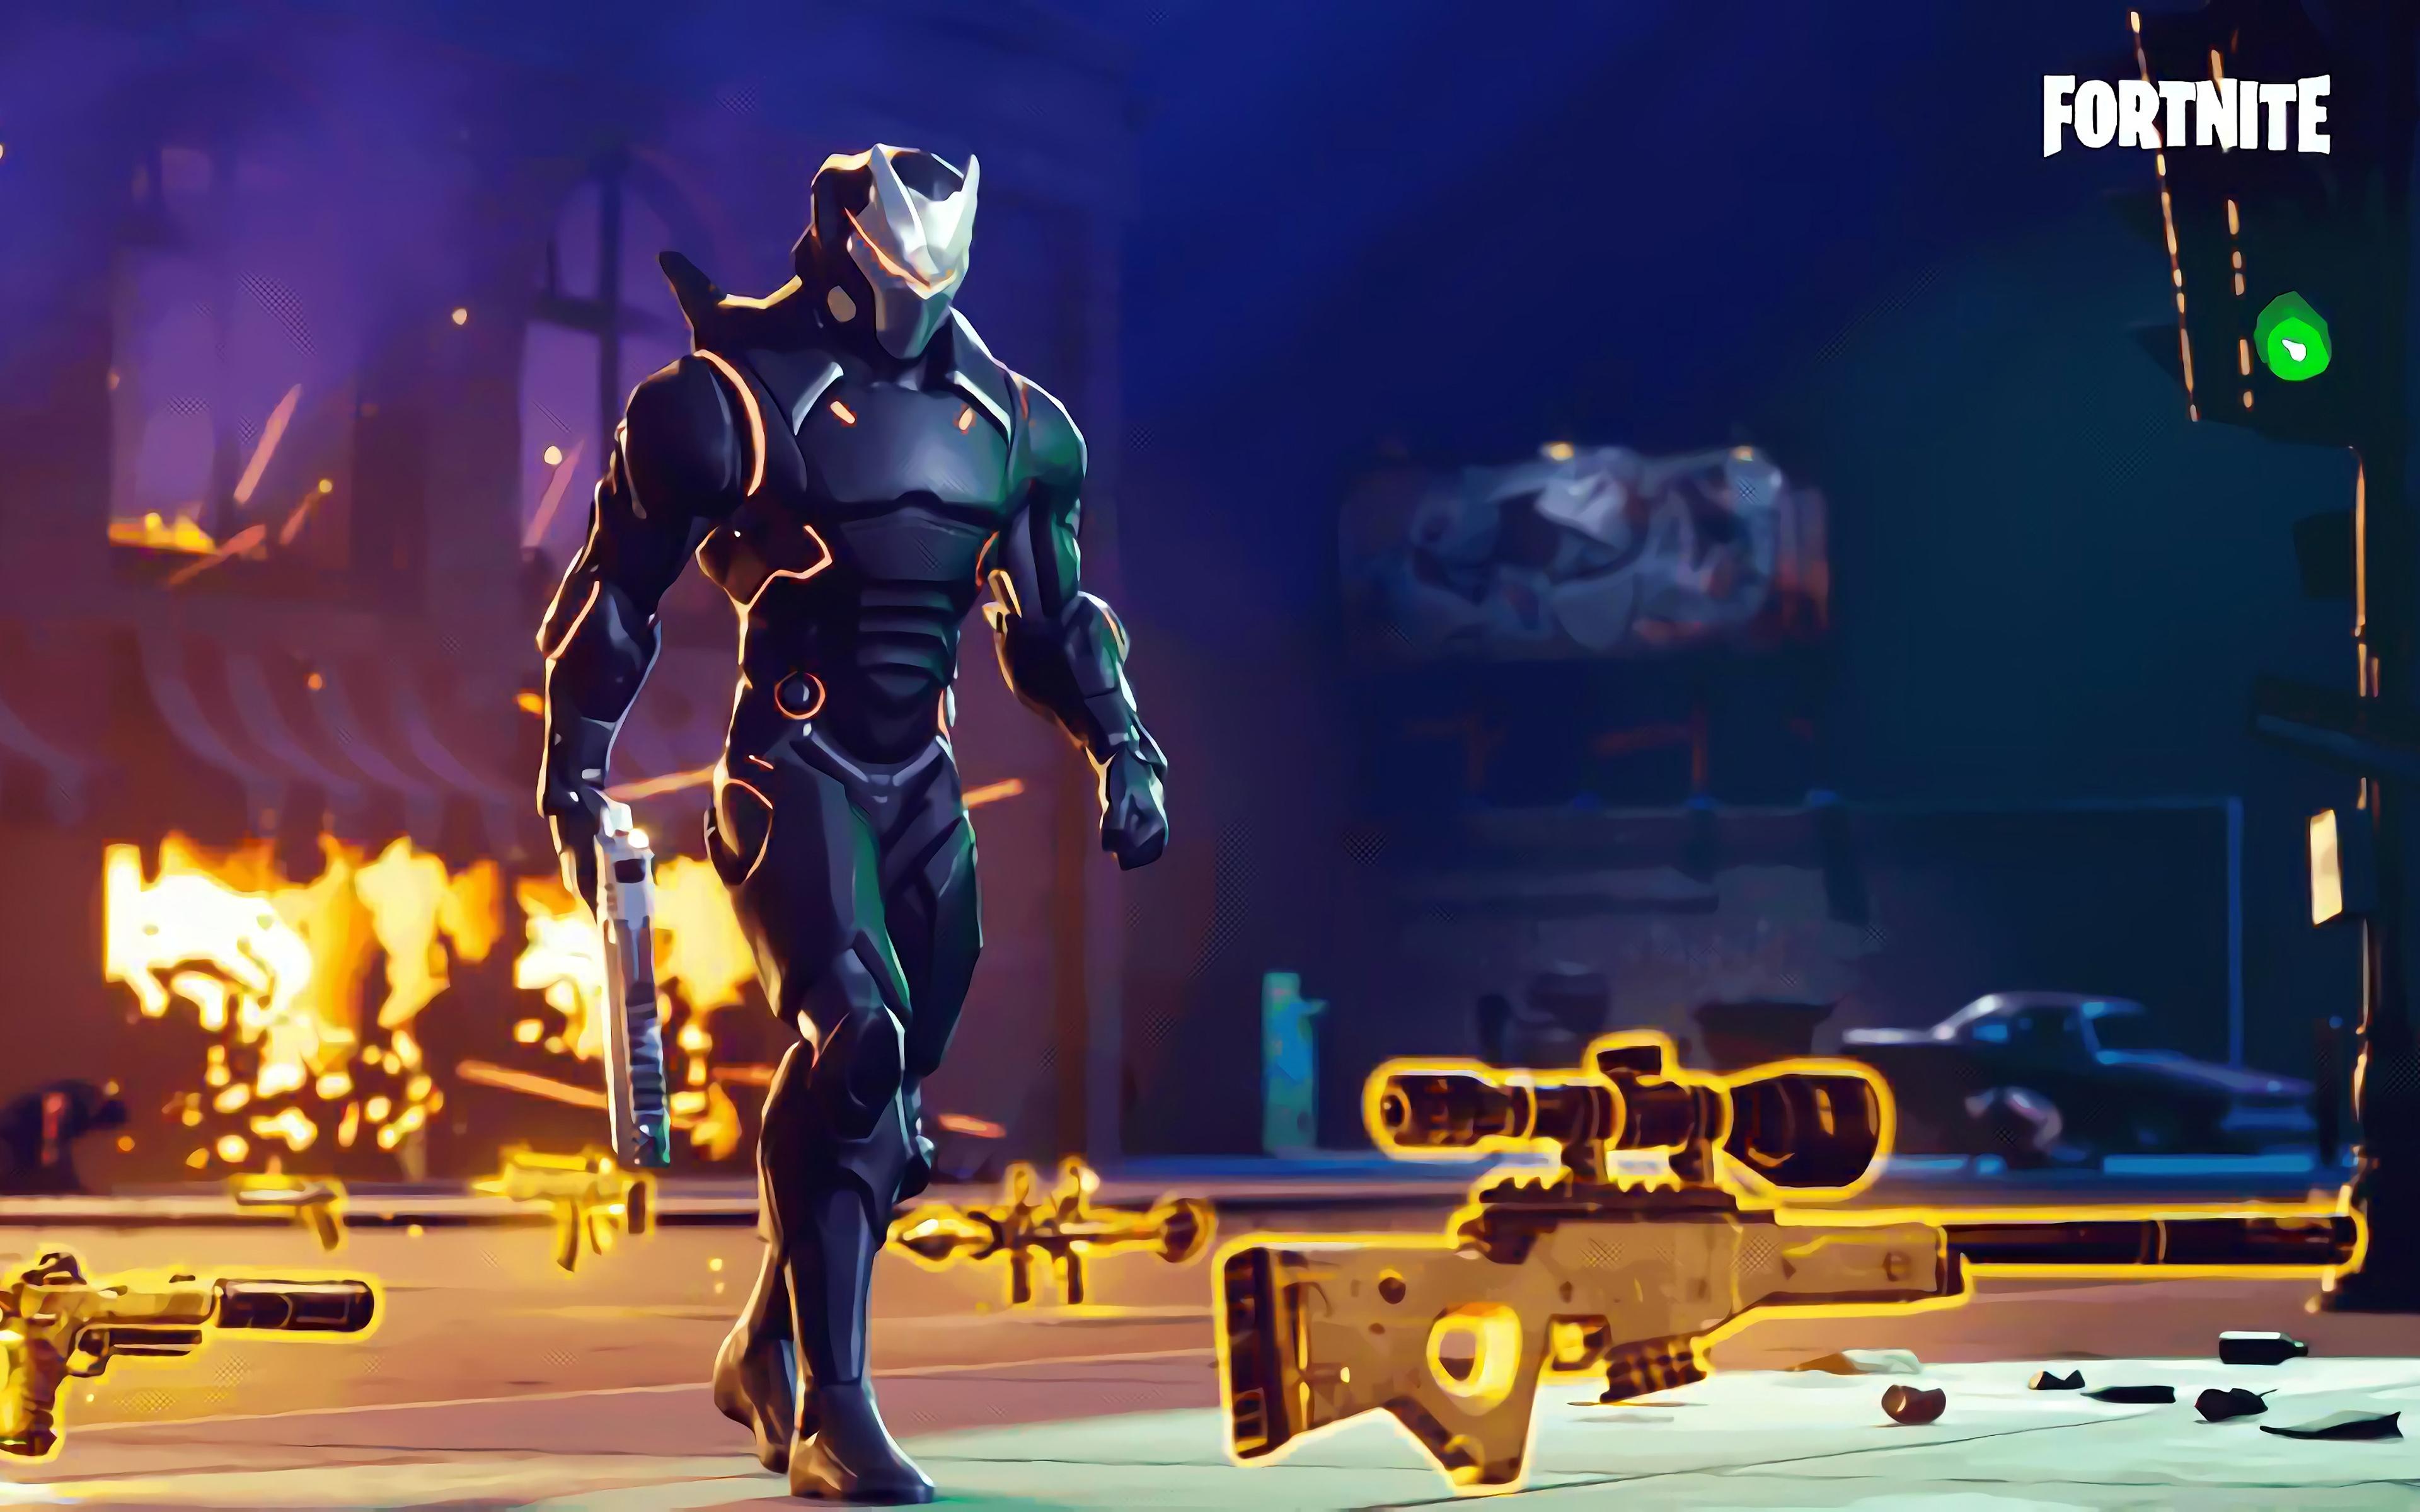 4k, Omega, Fortnite, Season 5, 2018 Games, Cyber Warrior, - Cool Background Fort Nite , HD Wallpaper & Backgrounds